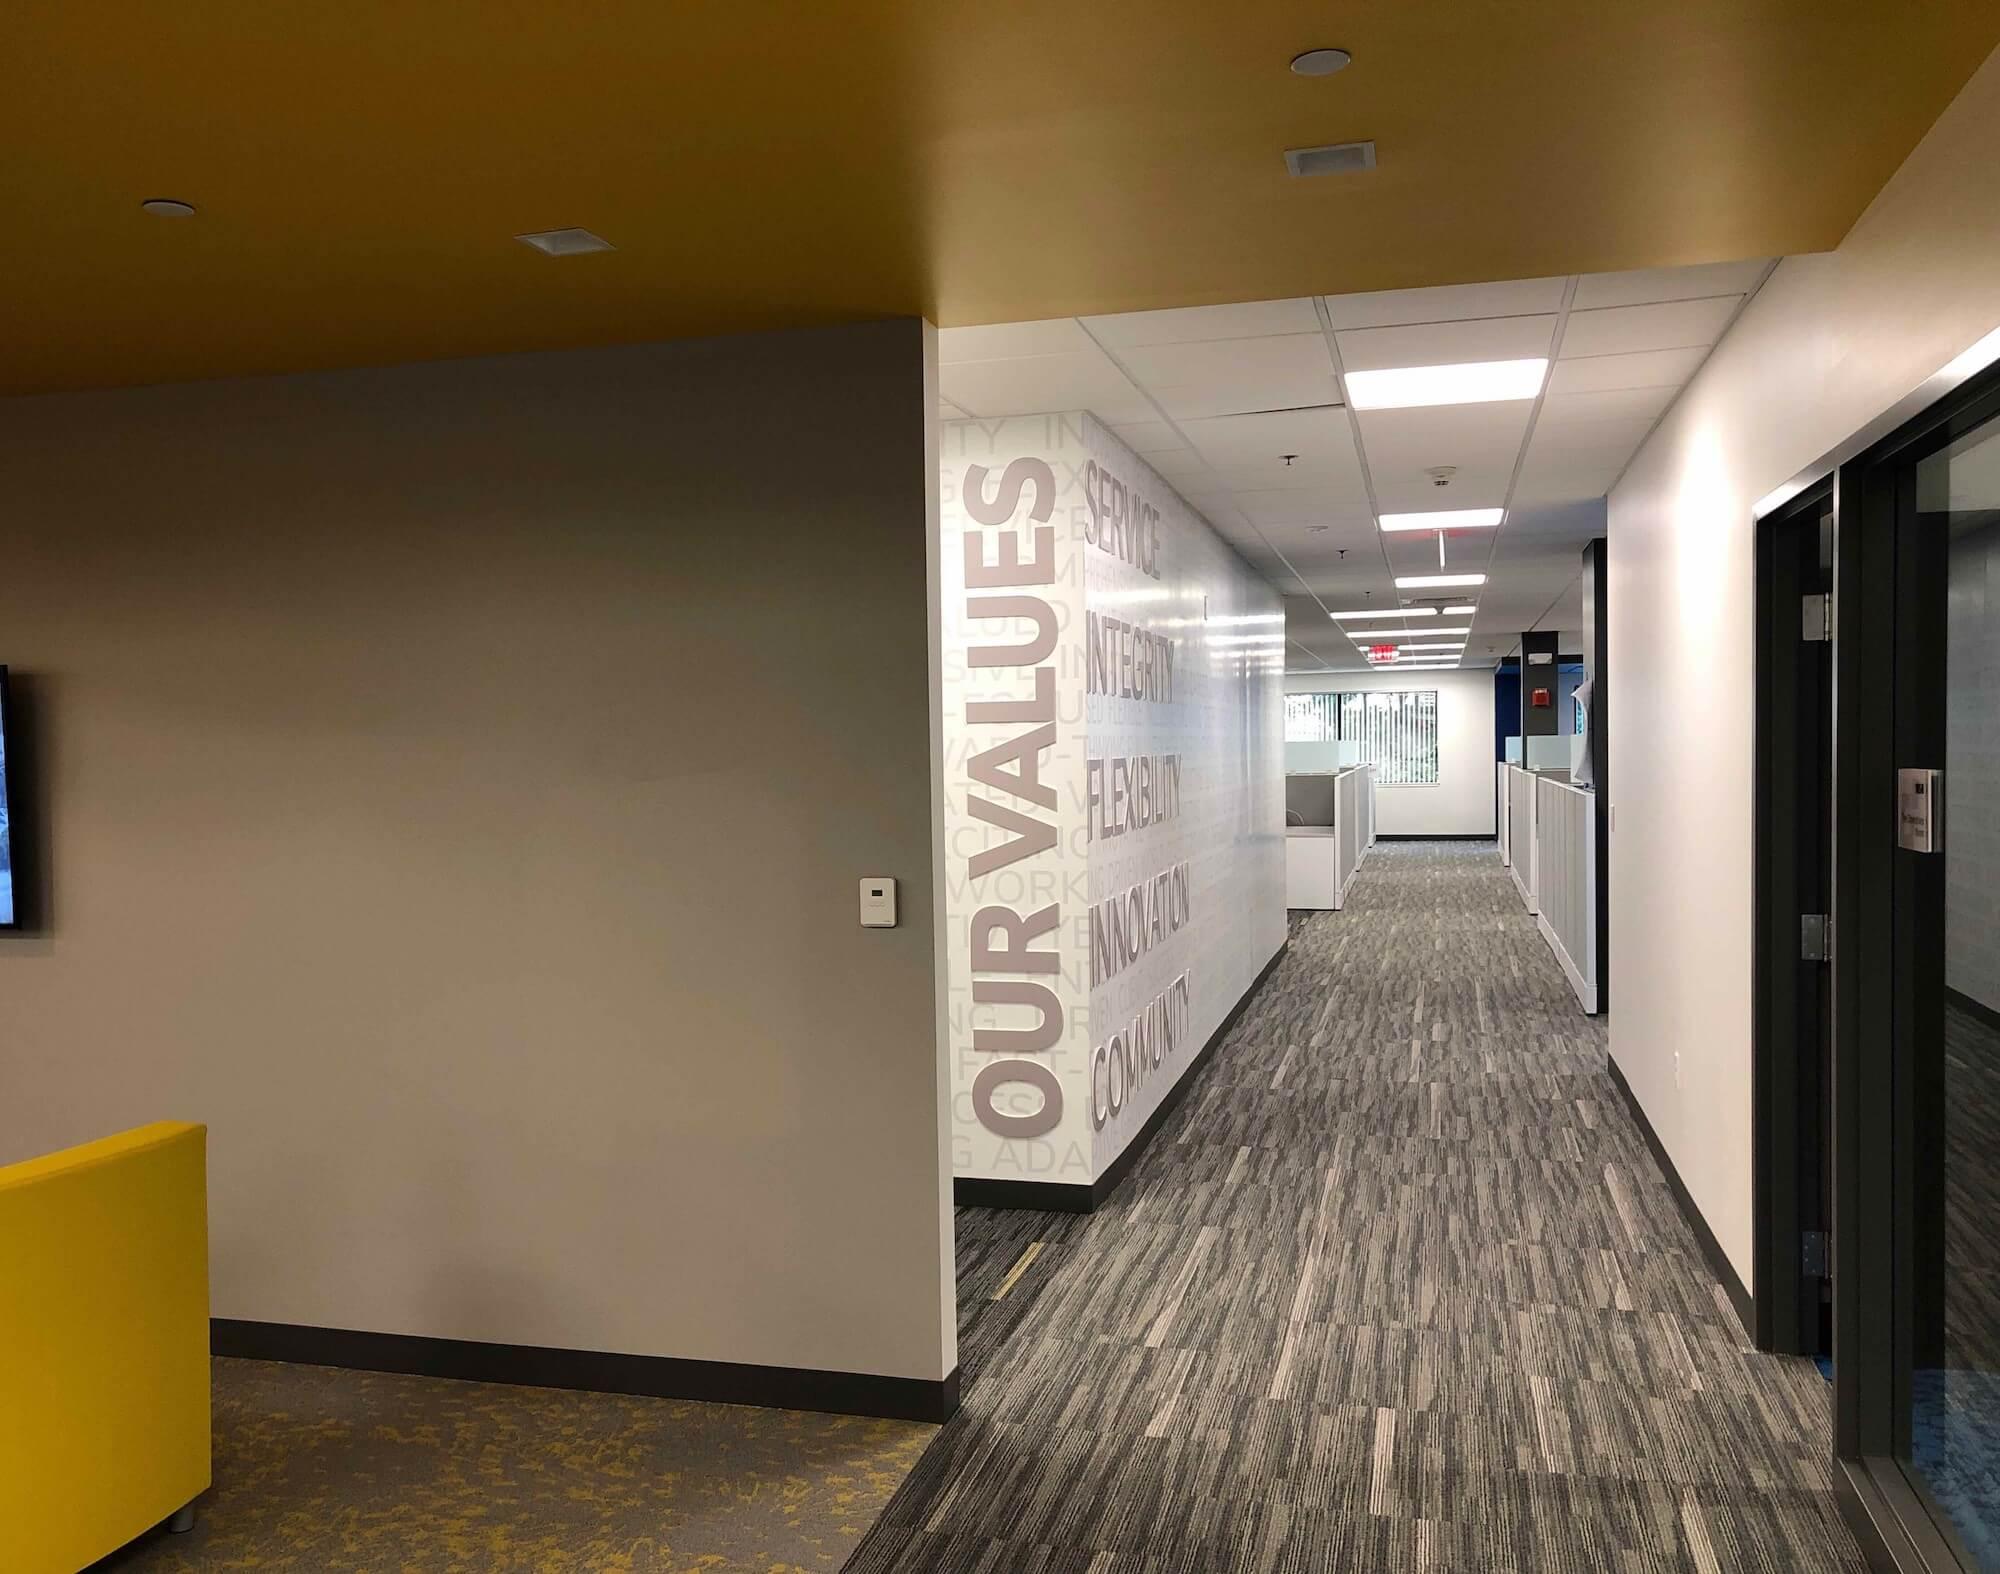 Interior of office hallway